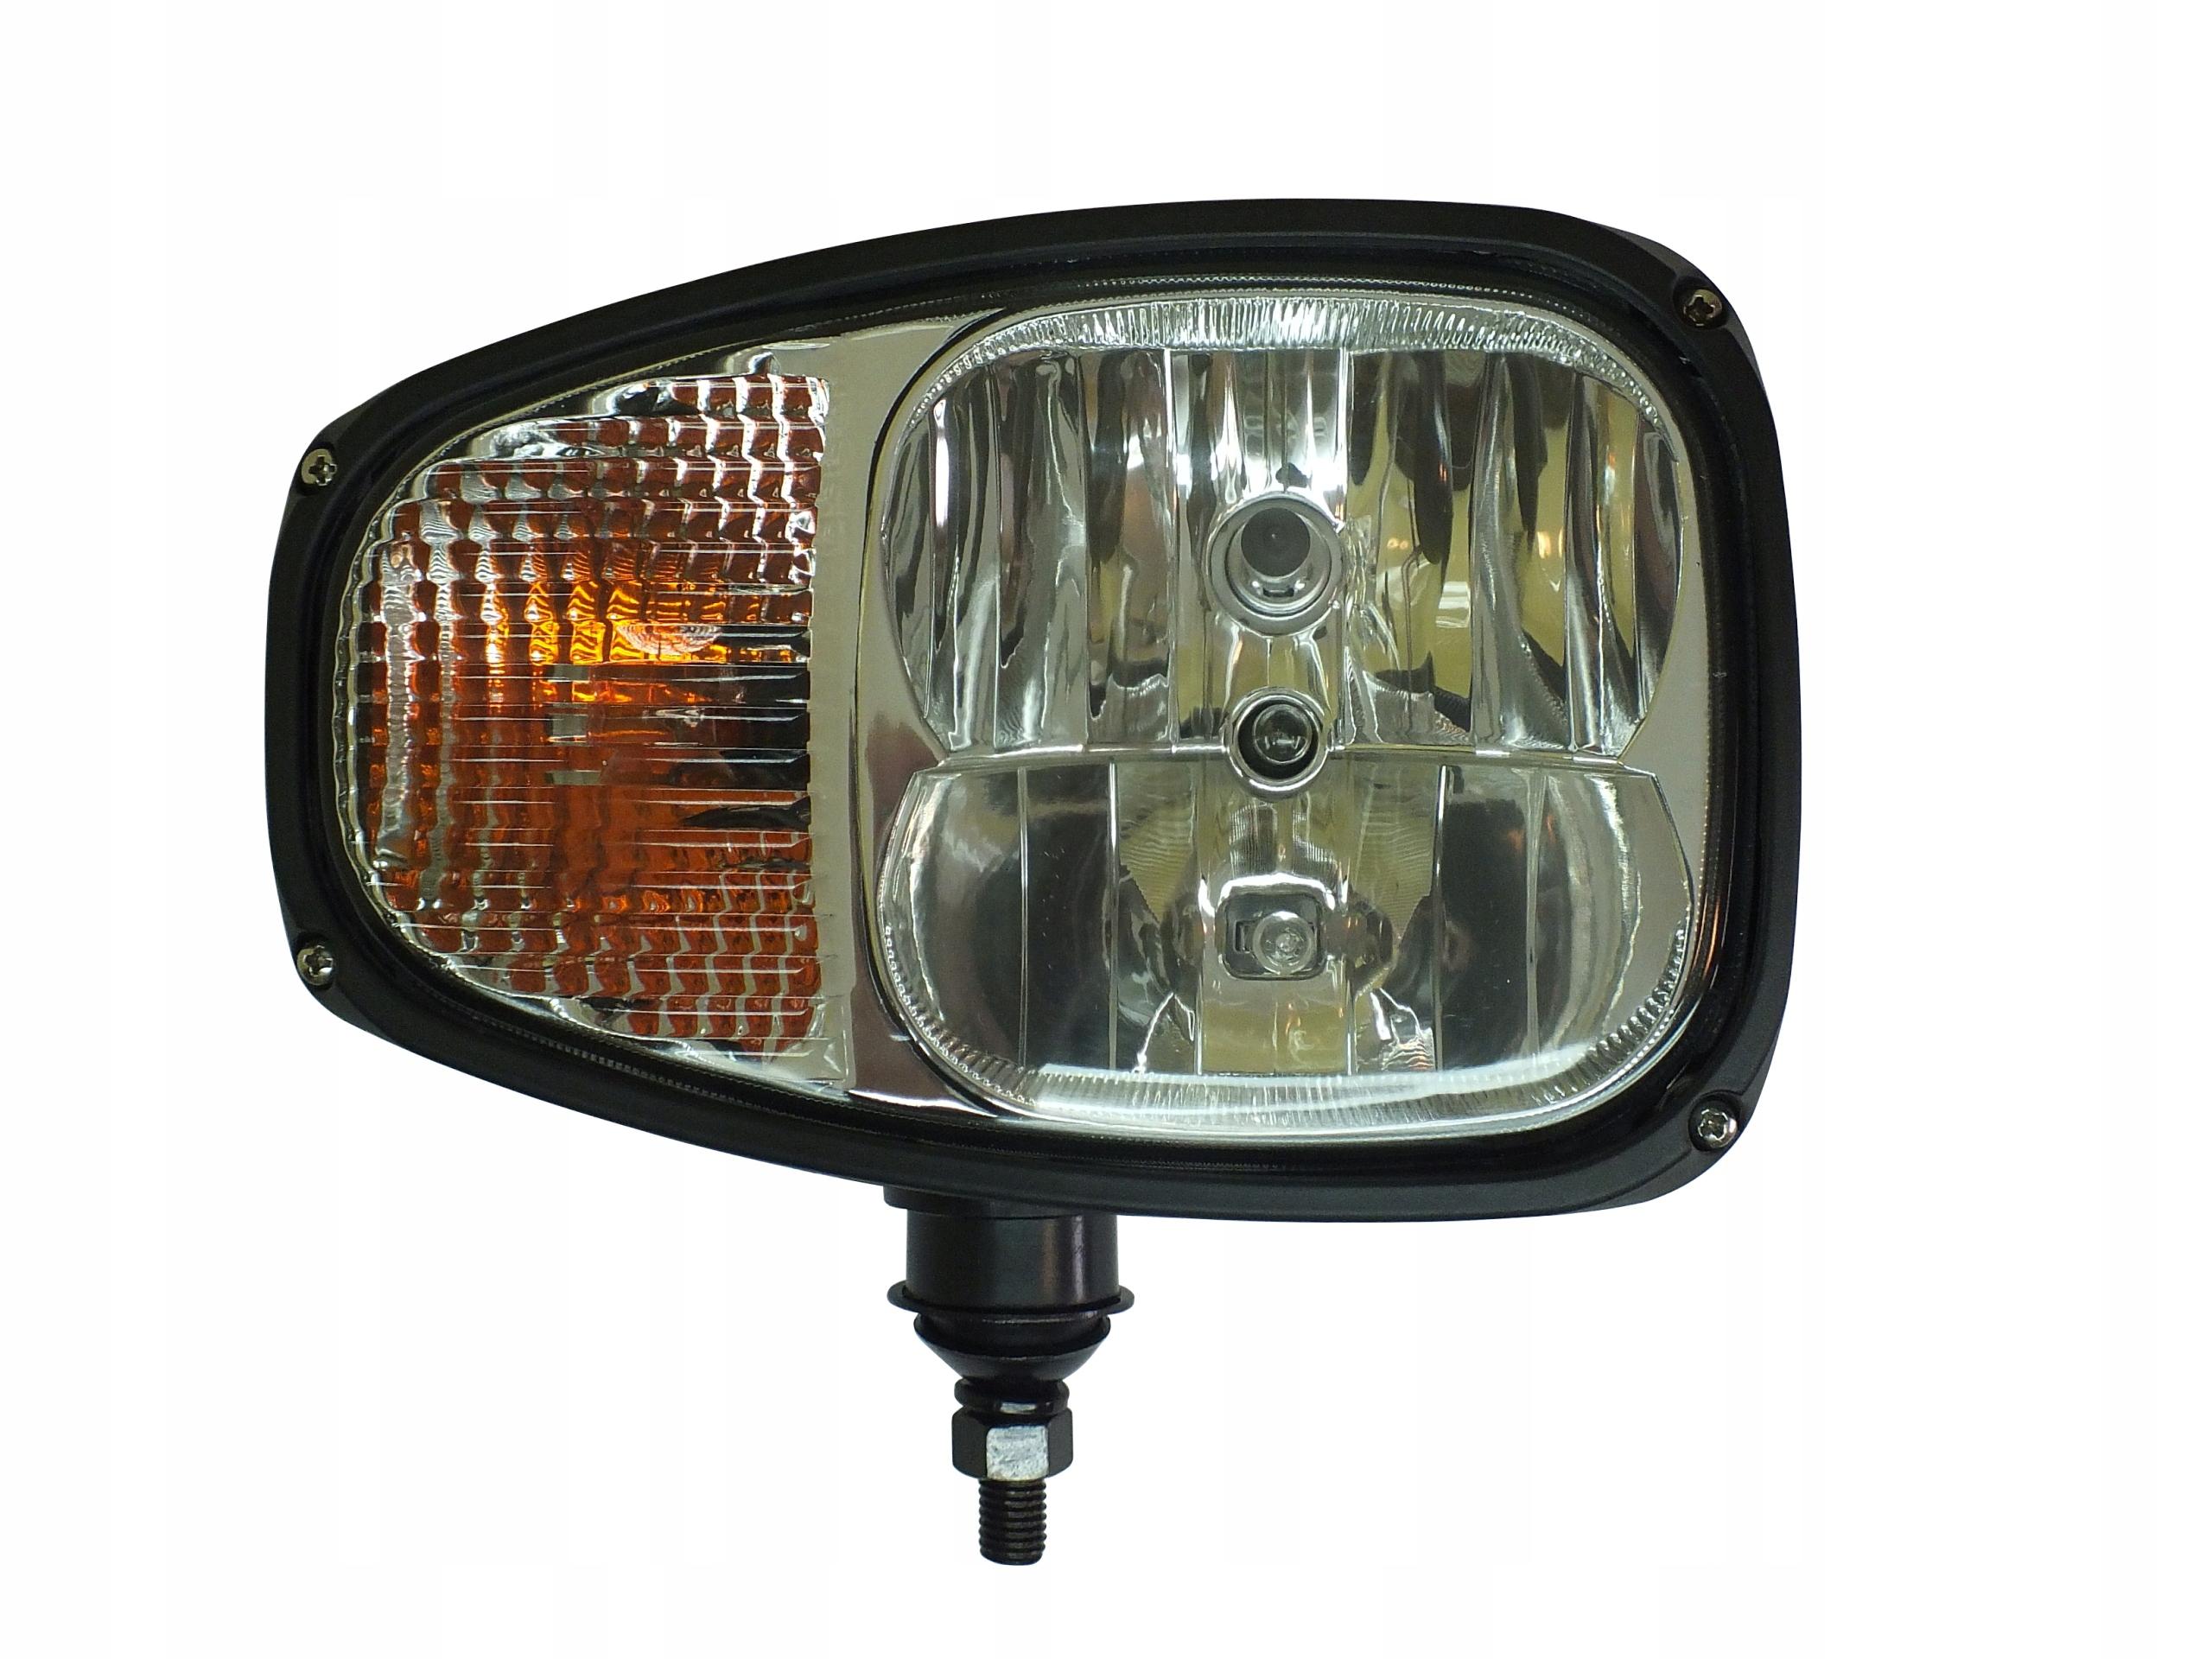 Lampa przednia prawa JCB,Cat,Manitou,Volvo,Terex